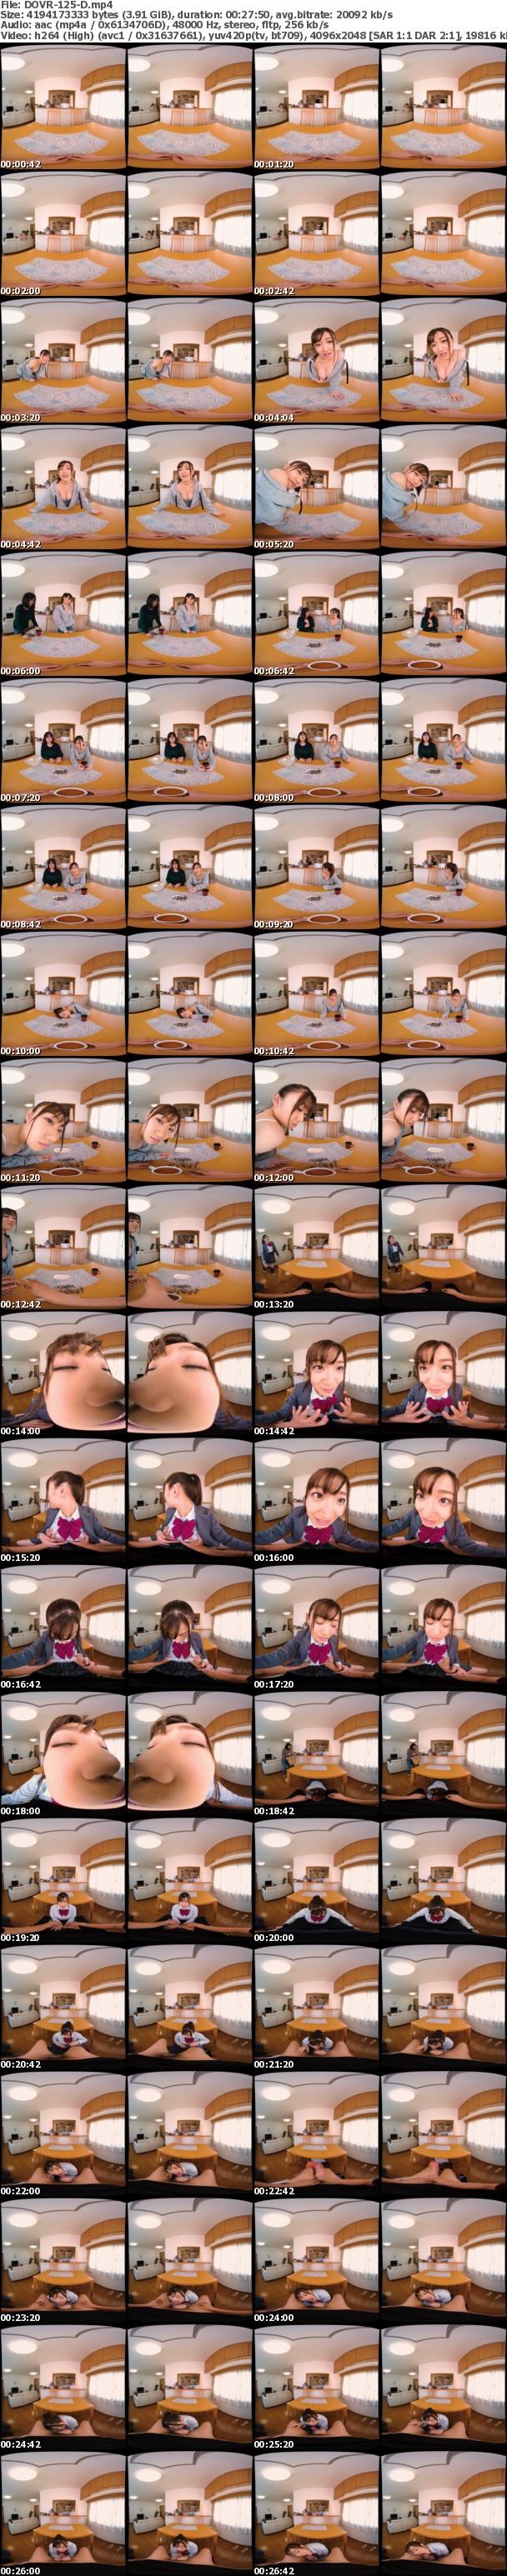 (VR) DOVR-125 【まとめ買い特典あり】「私のこと好きでしゅ?」いちゃラブ系甘えん坊サキュバスか、「お兄ちゃんと離れるなんてイヤ!」と密着してくる巨乳ベロチュウ妹、どっちの小梅えなが好き? 完全版